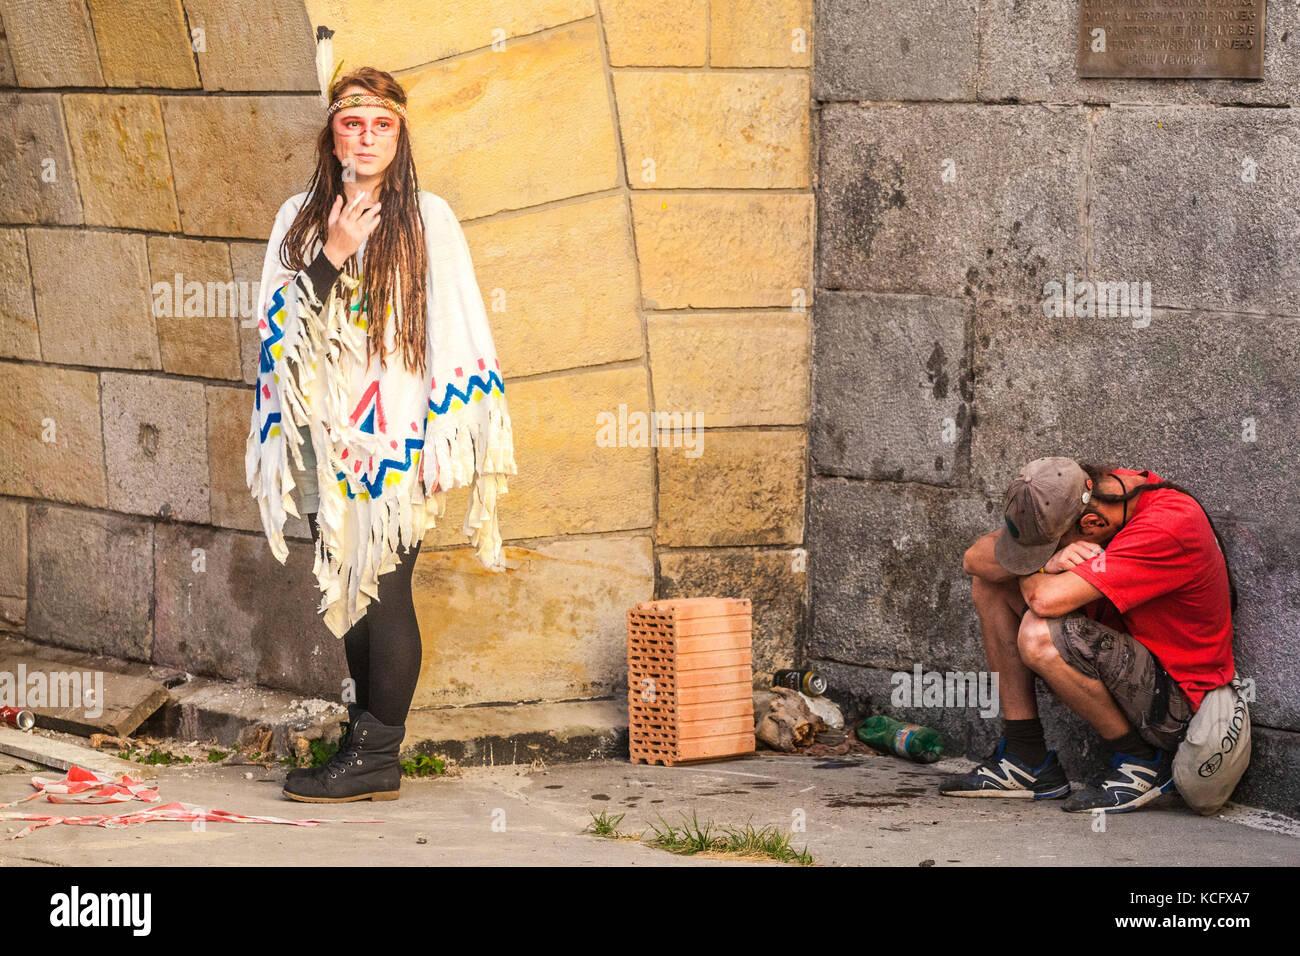 Young girl in Indian costume, Prague, alternative culture, Czech Republic - Stock Image